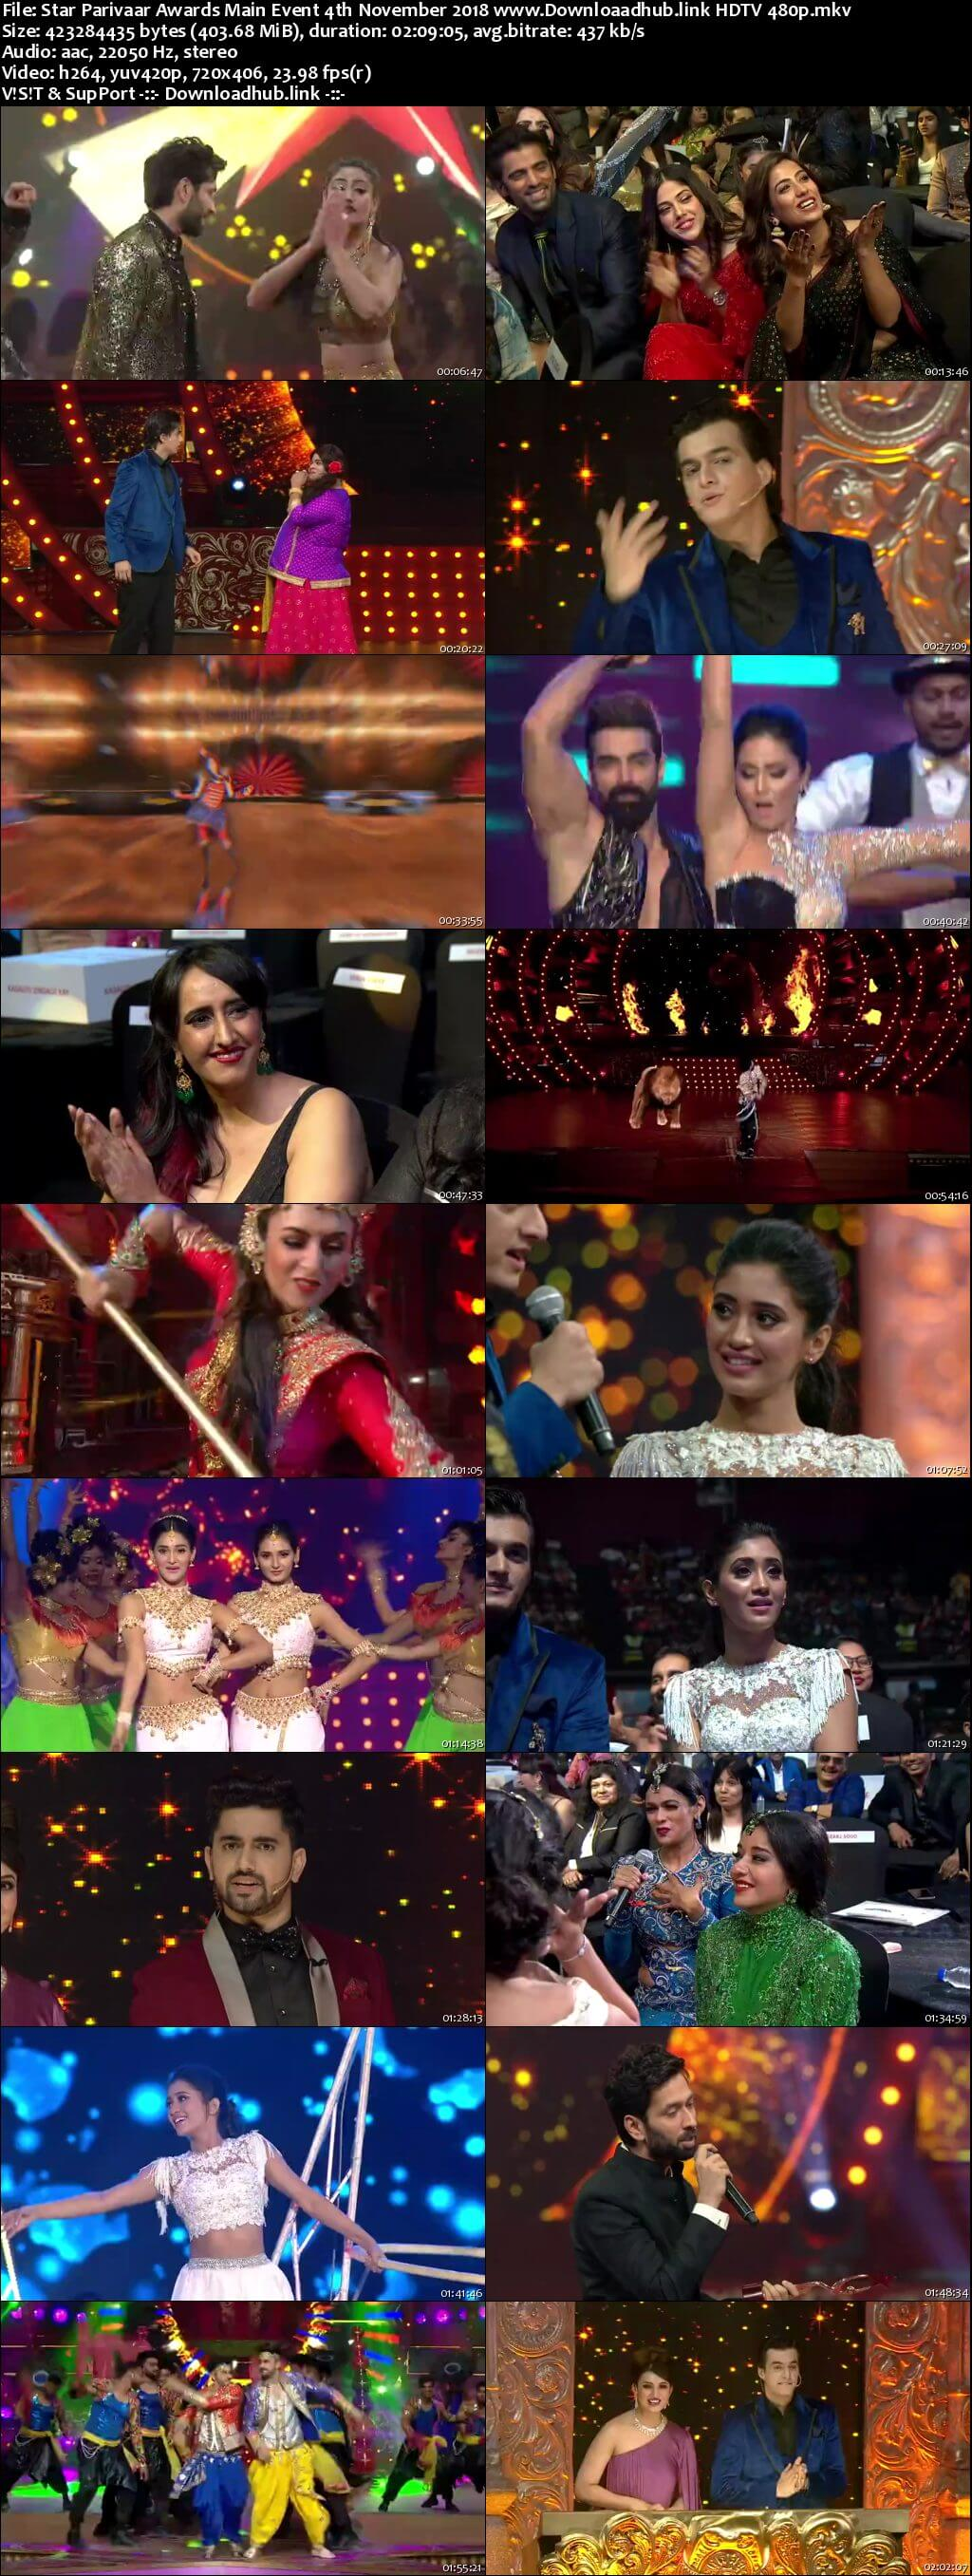 Star Parivaar Awards (Main Event) 4th November 2018 400MB HDTV 480p